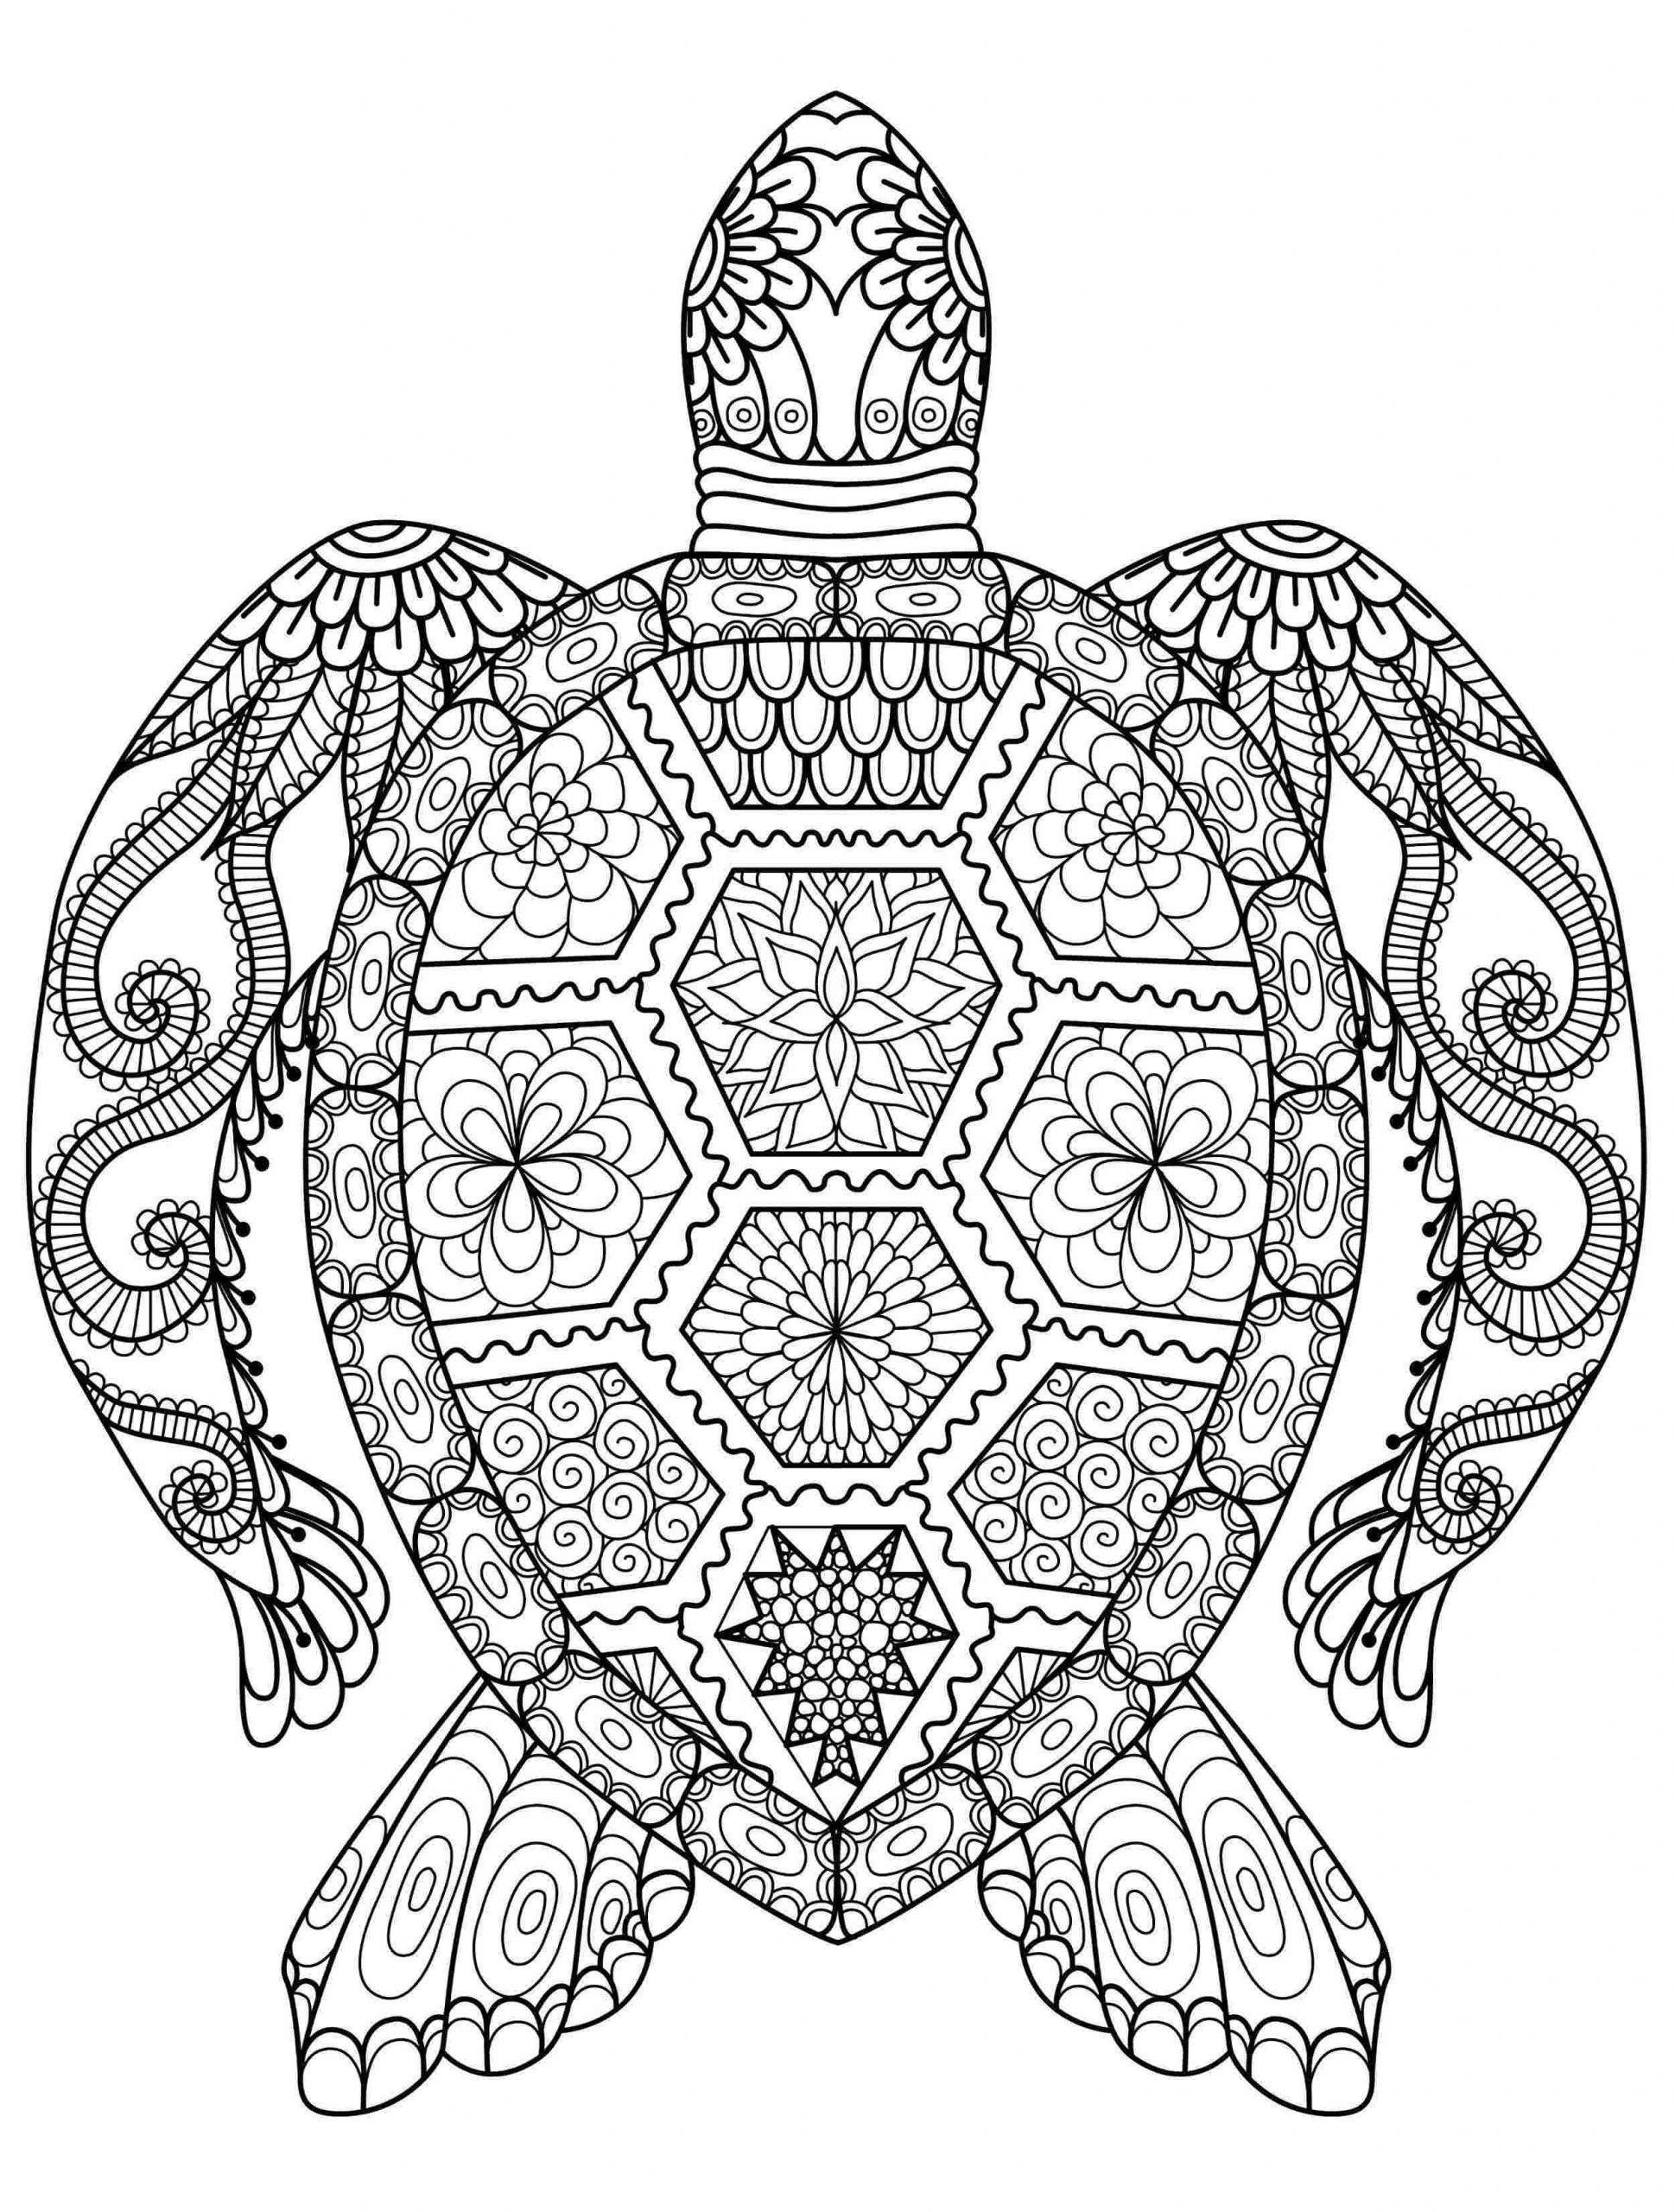 Printable Mandala Coloring Pages Pdf Animal Mandalas Coloring Pages Printable Animal Coloring In 2020 Turtle Coloring Pages Animal Coloring Books Animal Coloring Pages